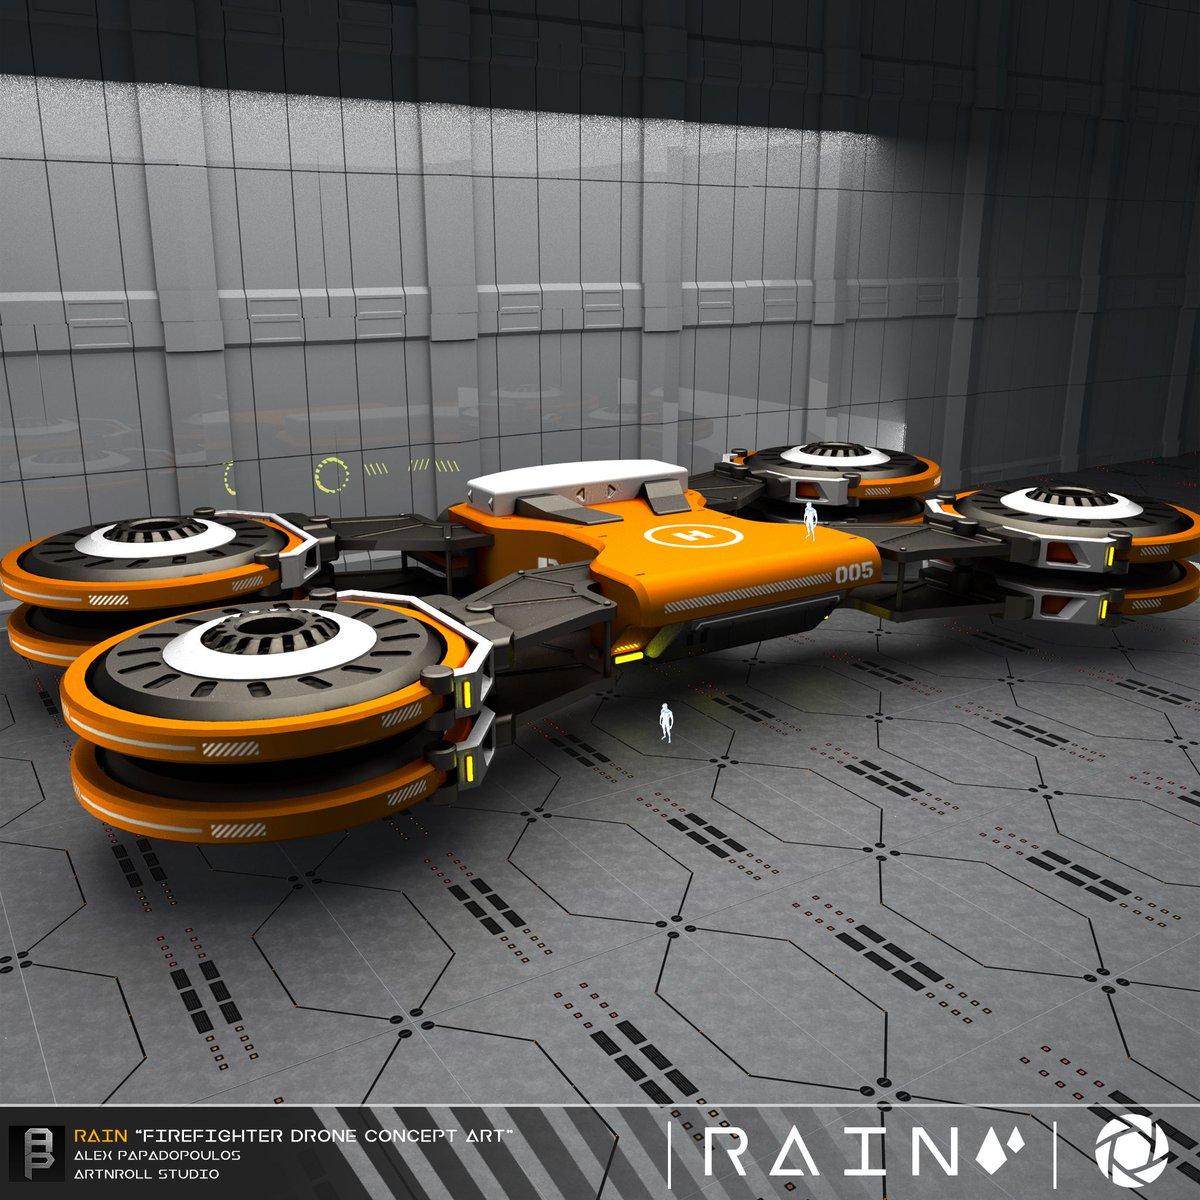 """Rain"" Firefighter Drone Concept. #conceptart #mechanical #hardsurface #space #drone #firefighter #concept #design #future #scifi #modern #visual #engineering #digital #art #3D #moi3D #3dsmax #3dart #3dmodelling #kitbash #zbrush #hardsurfacemodeling #keyshotpic.twitter.com/zUCWGTLdLR"